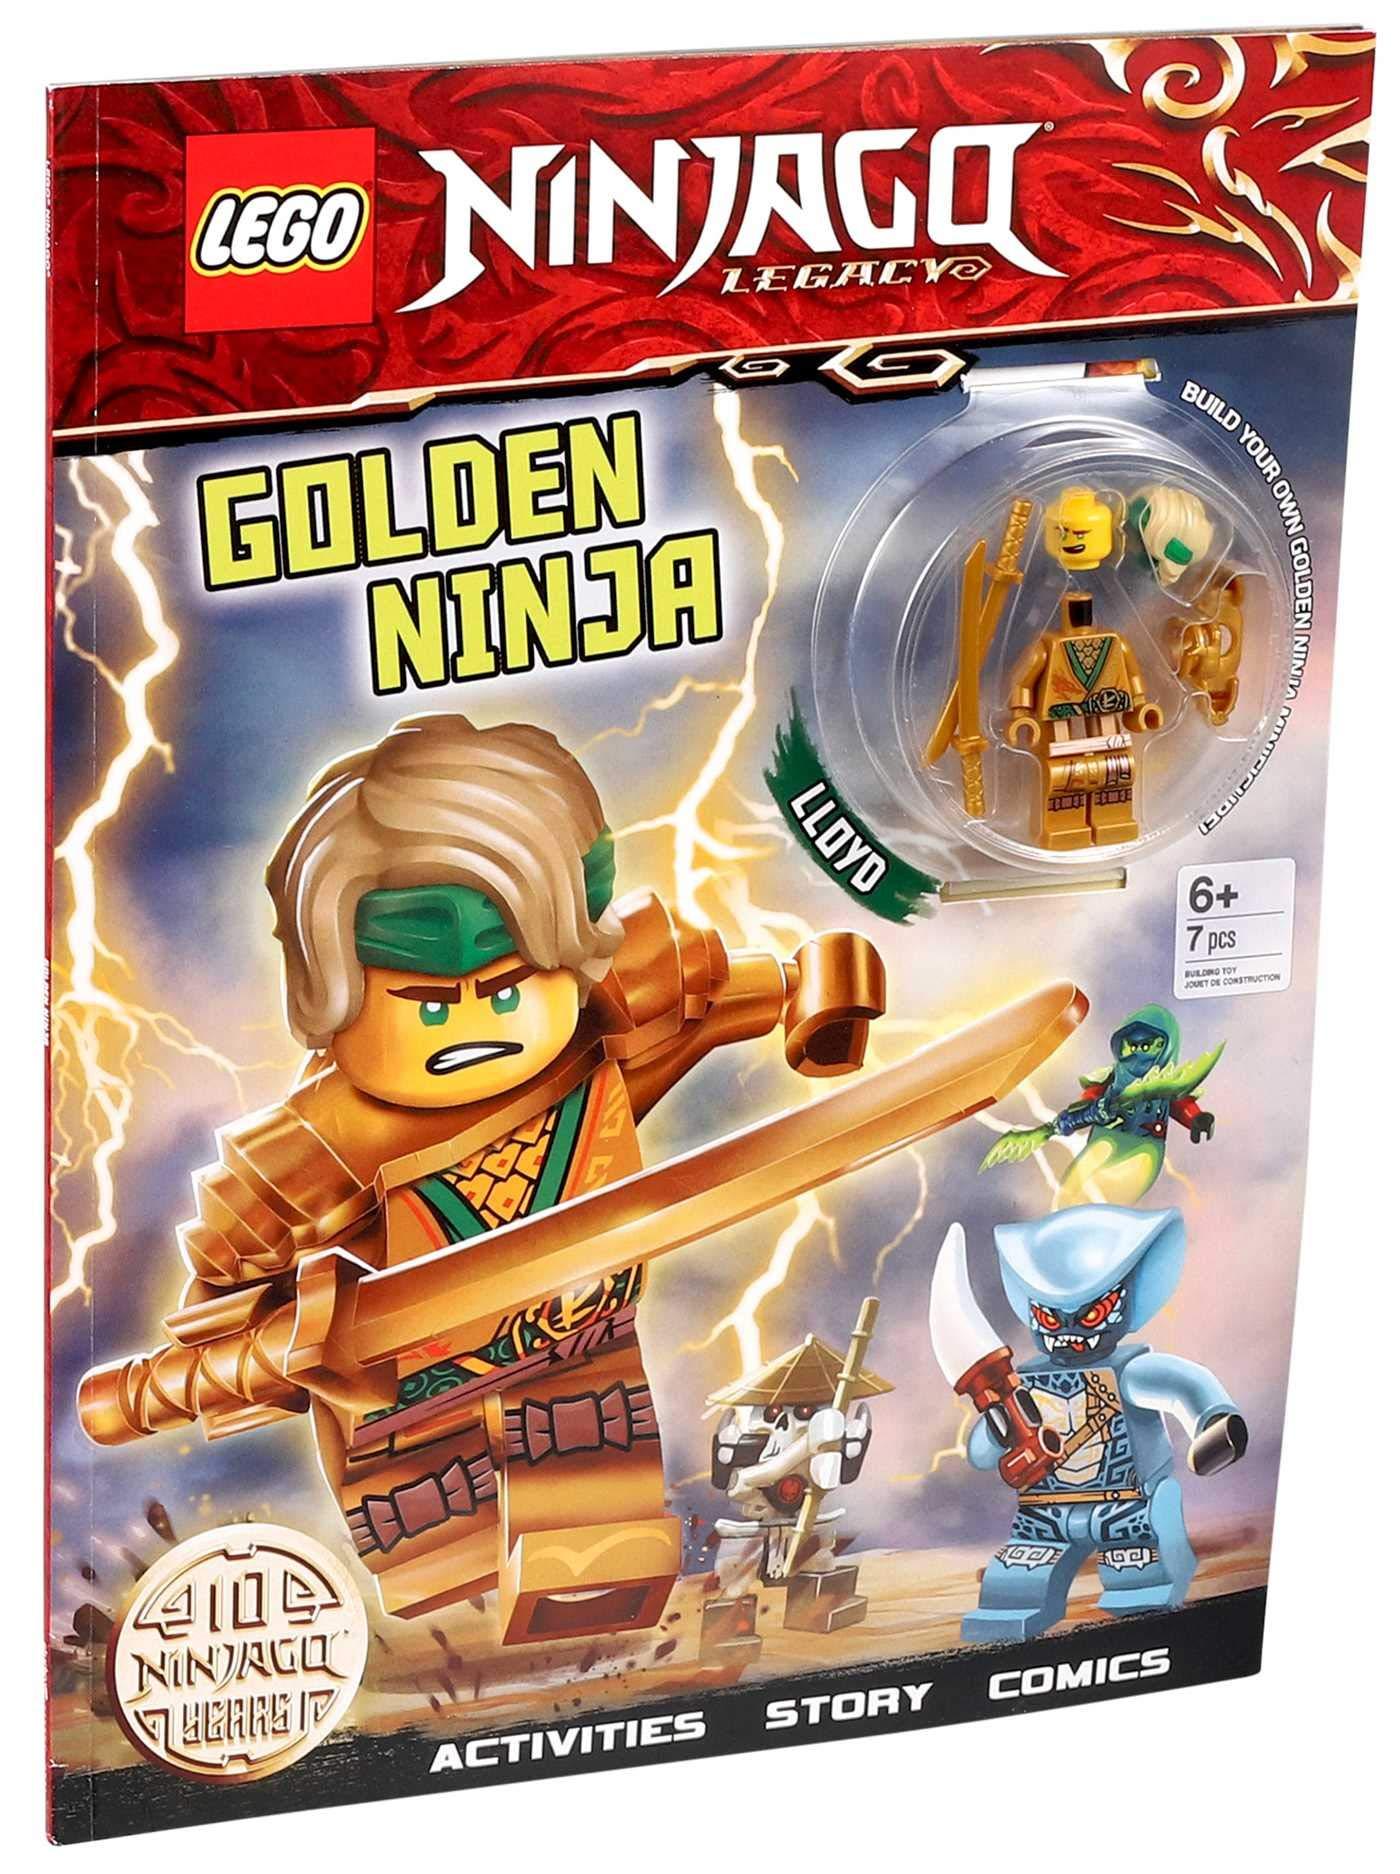 Amazon Com Lego R Ninjago R Golden Ninja Activity Book With Minifigure 9780794447519 Ameet Publishing Books